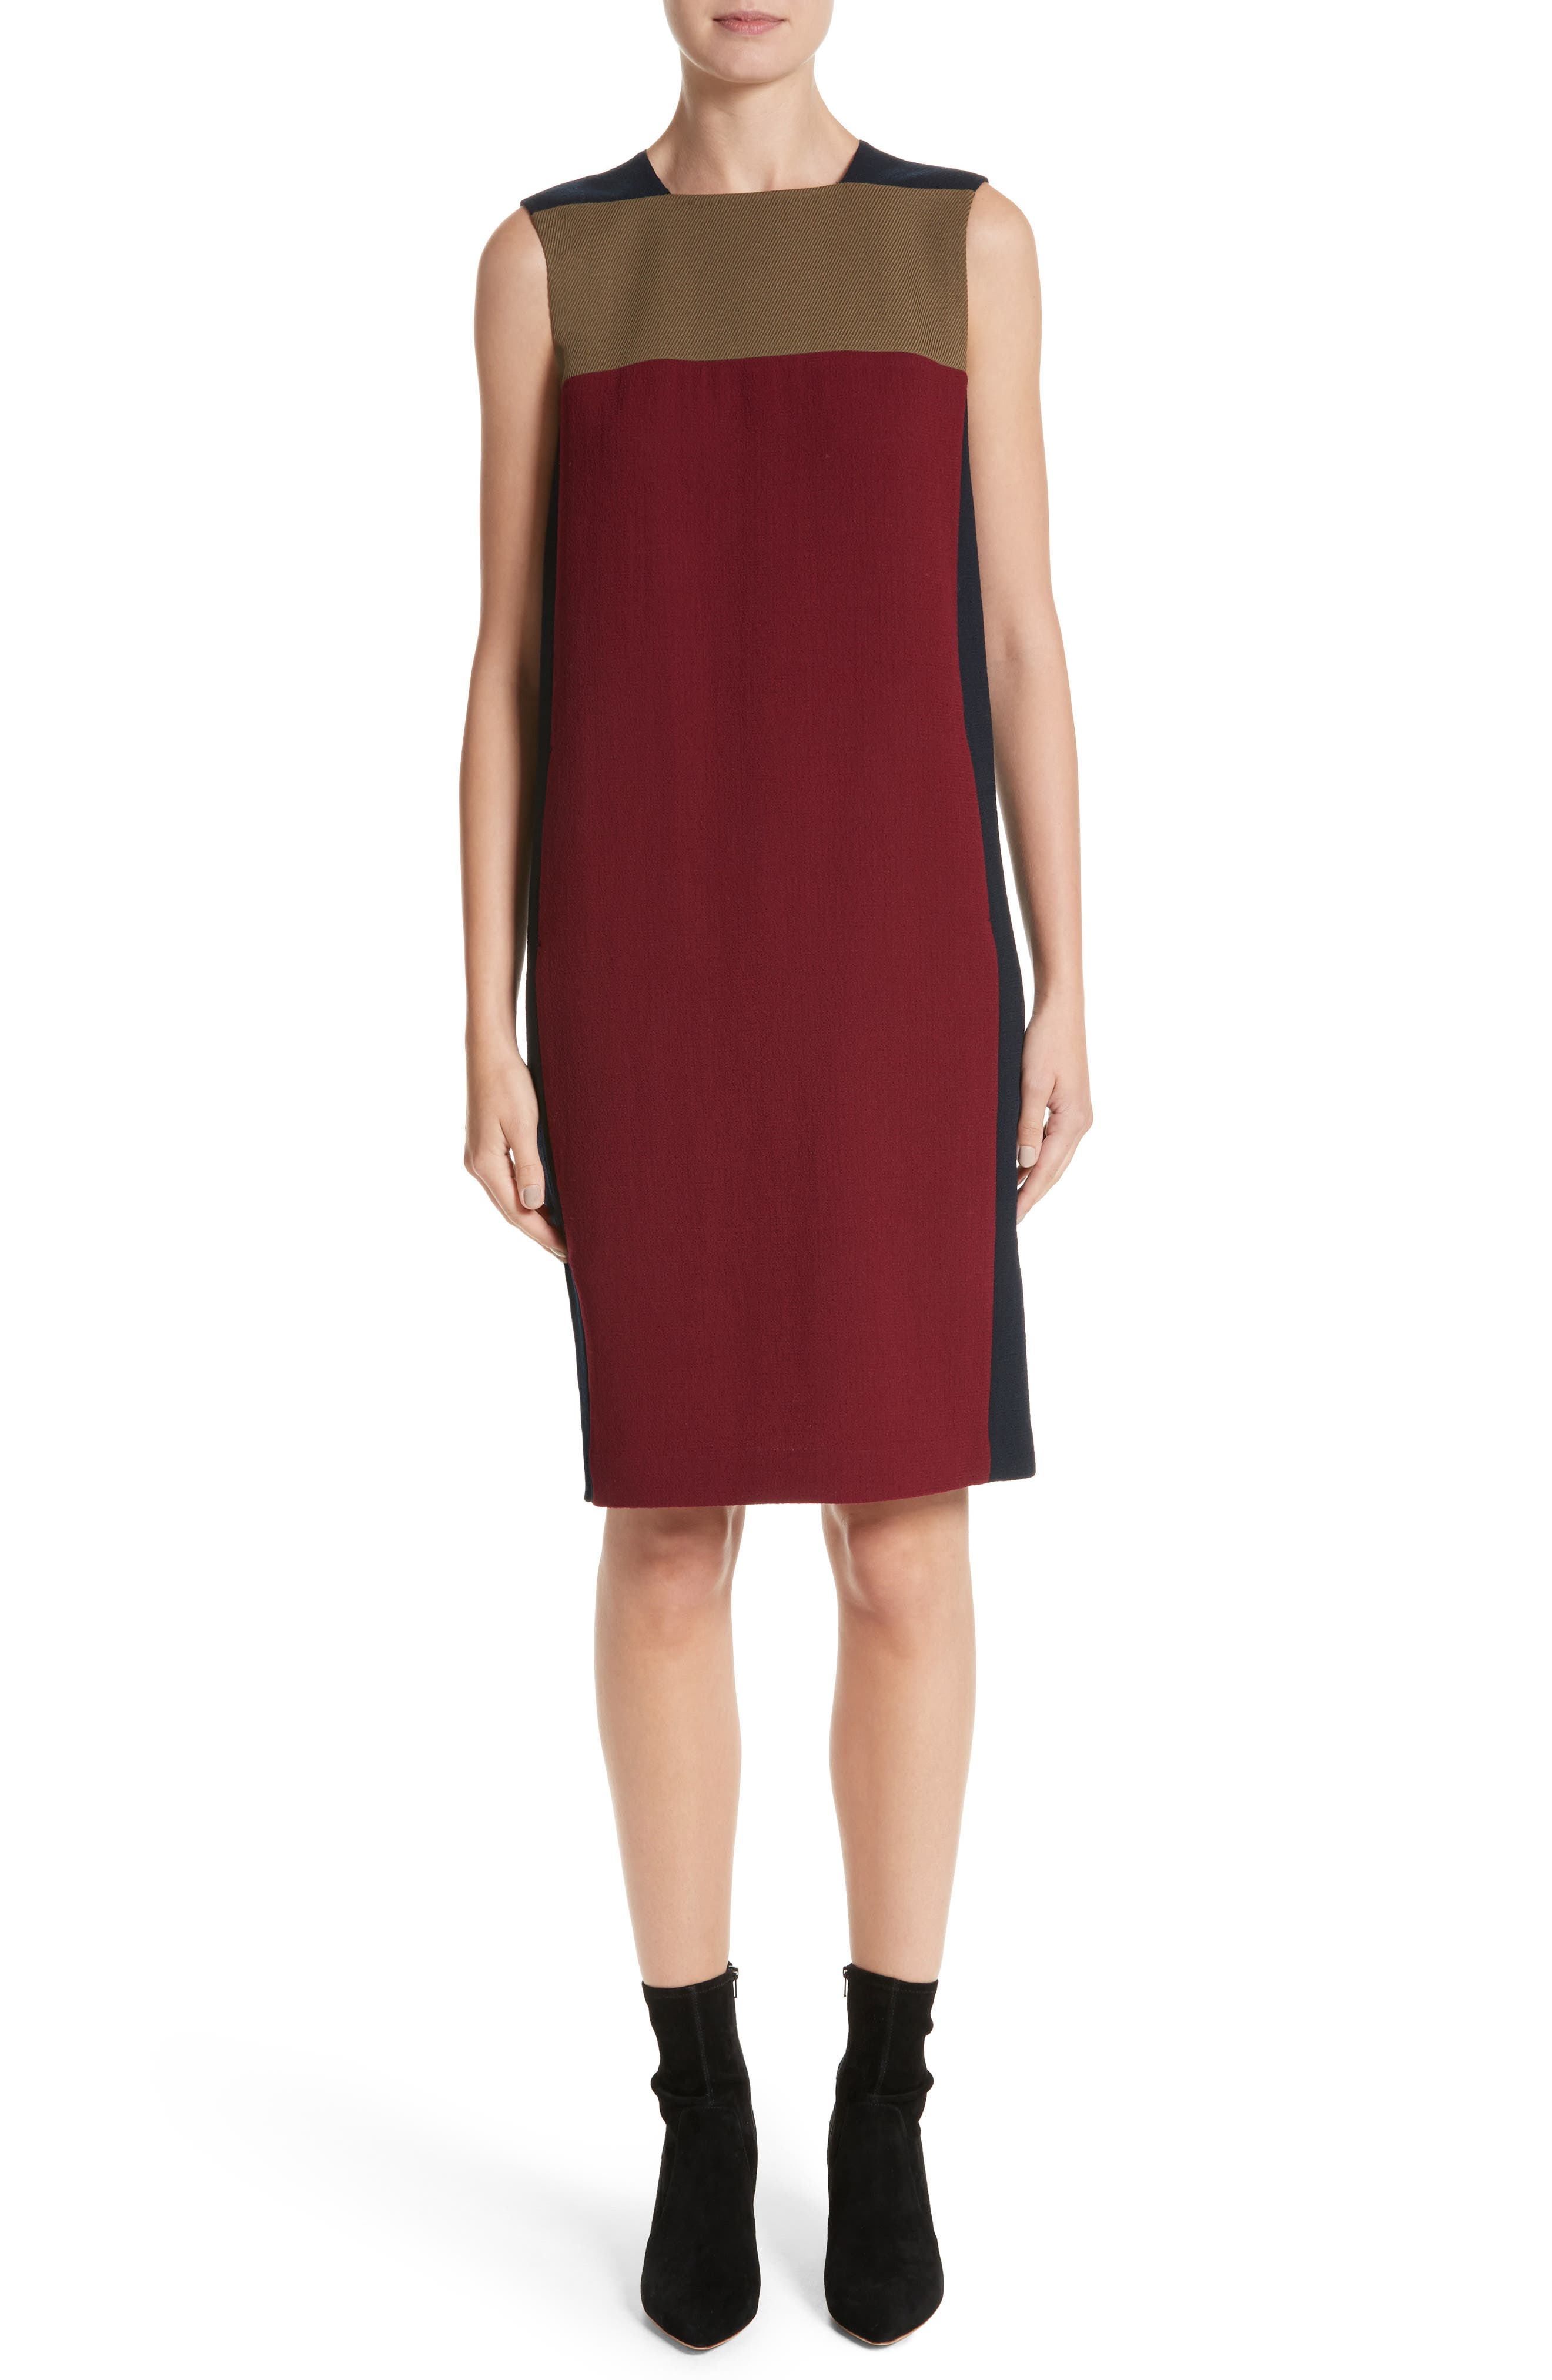 Main Image - Lafayette 148 New York Zandra Colorblock Nouveau Crepe Dress